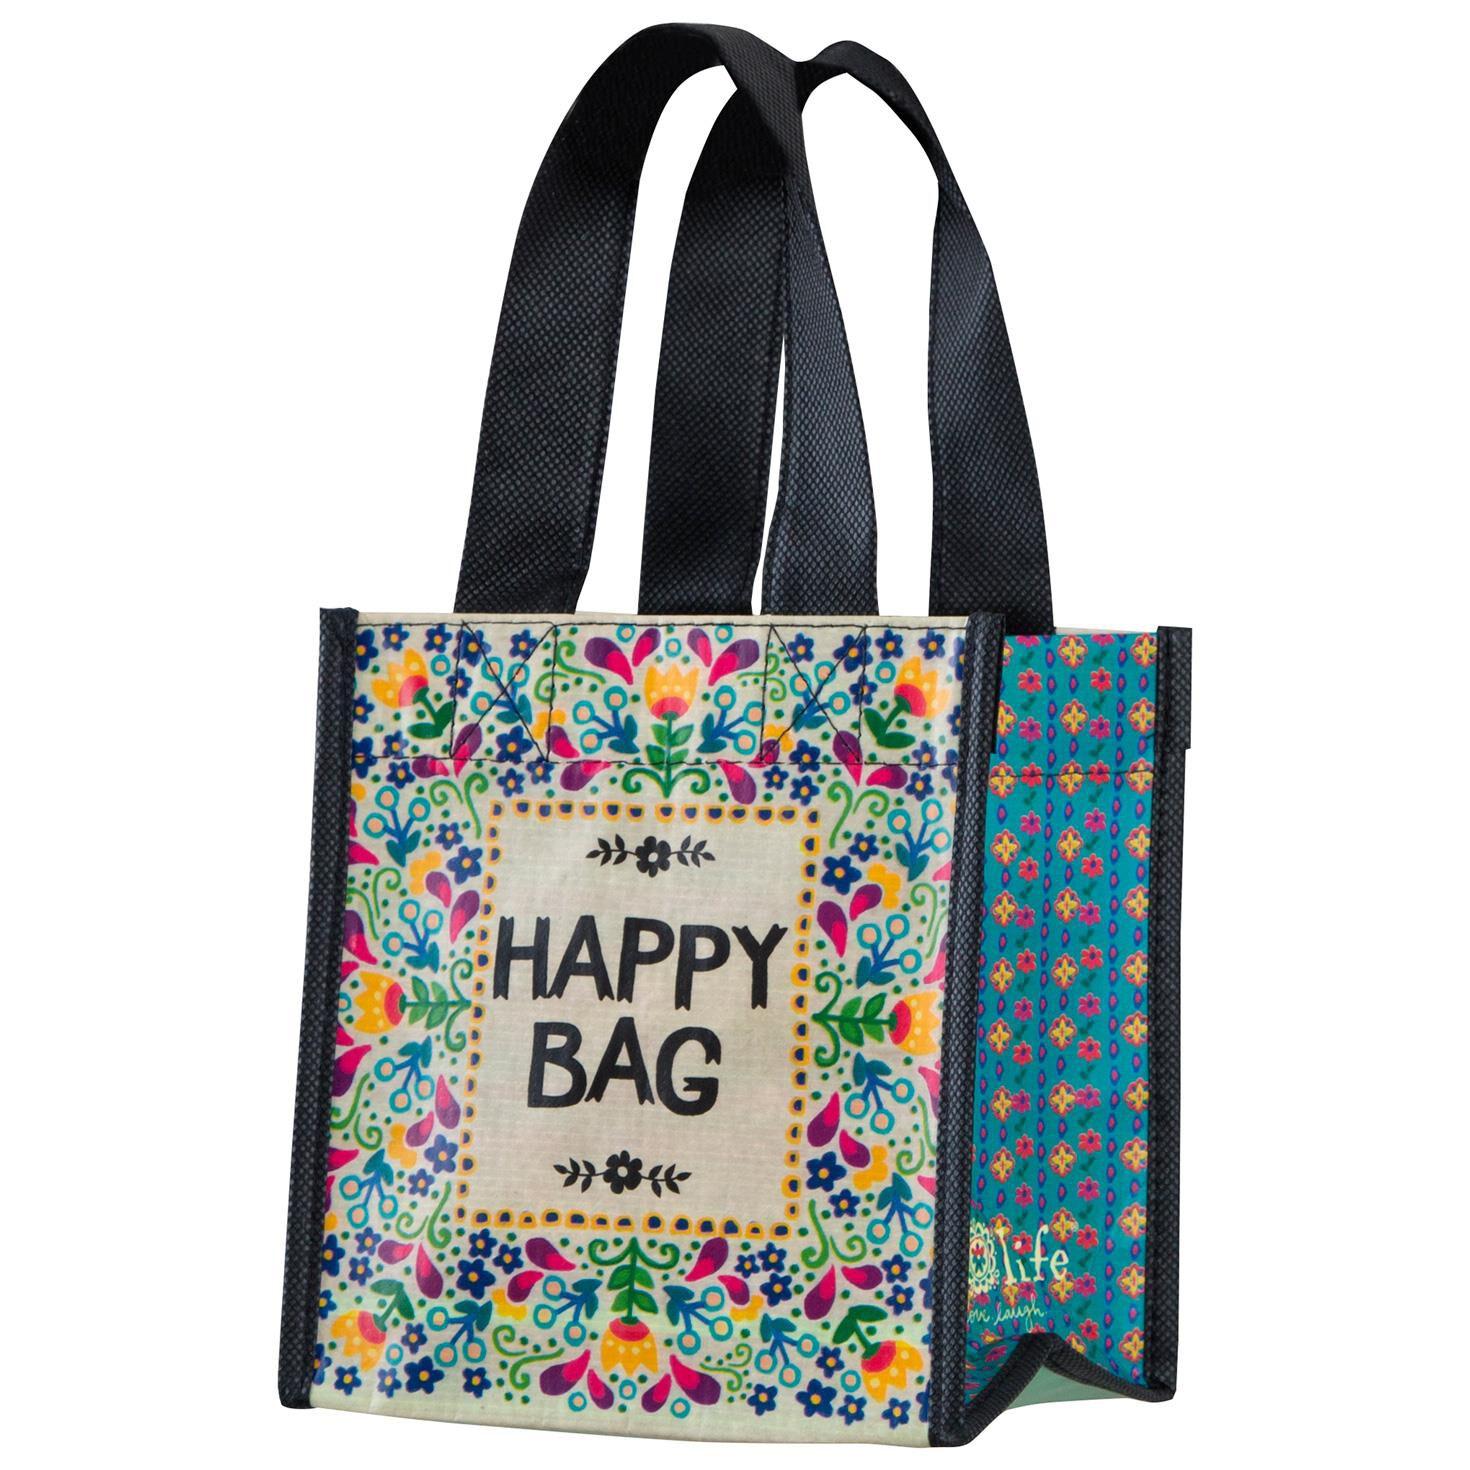 a61c554c8d23 Natural-Life-Happy-Bag-Small-Reusable-Gift-Bag -root-GBAG060 GBAG060 1470 1.jpg Source Image.jpg